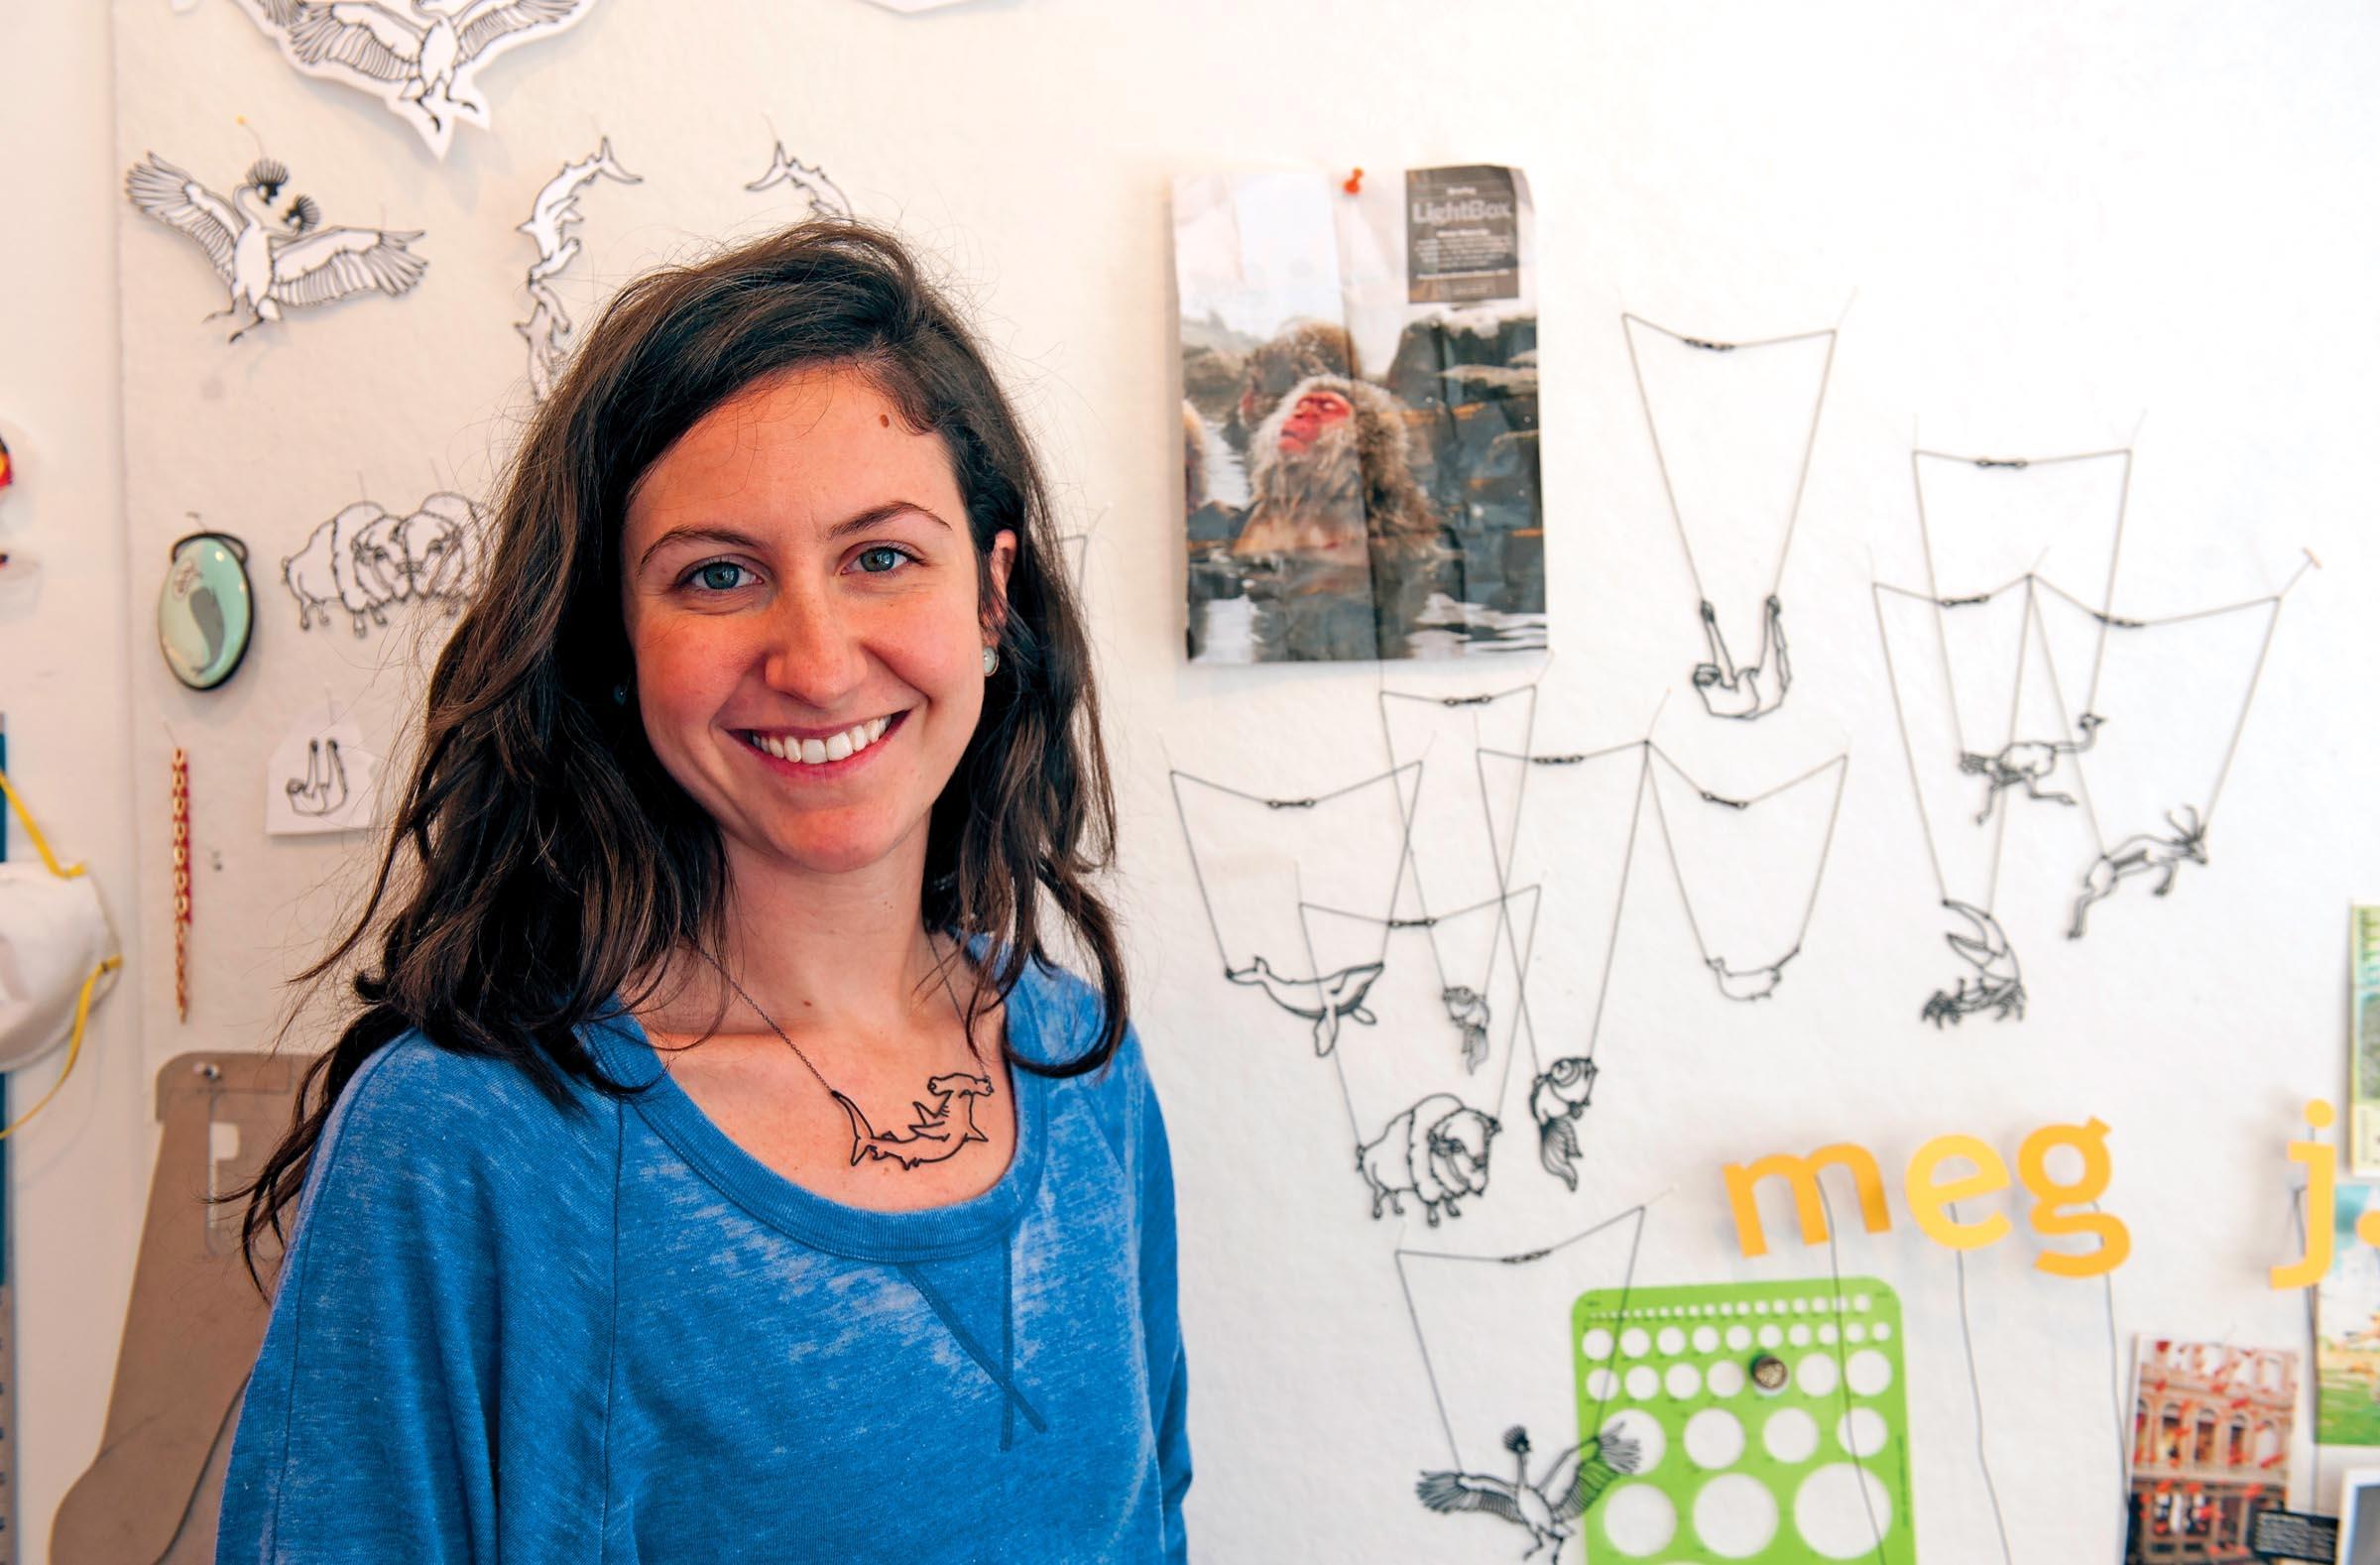 founder of ZUU studio, artist Meg Roberts (photo credit: Scott Elmquist)